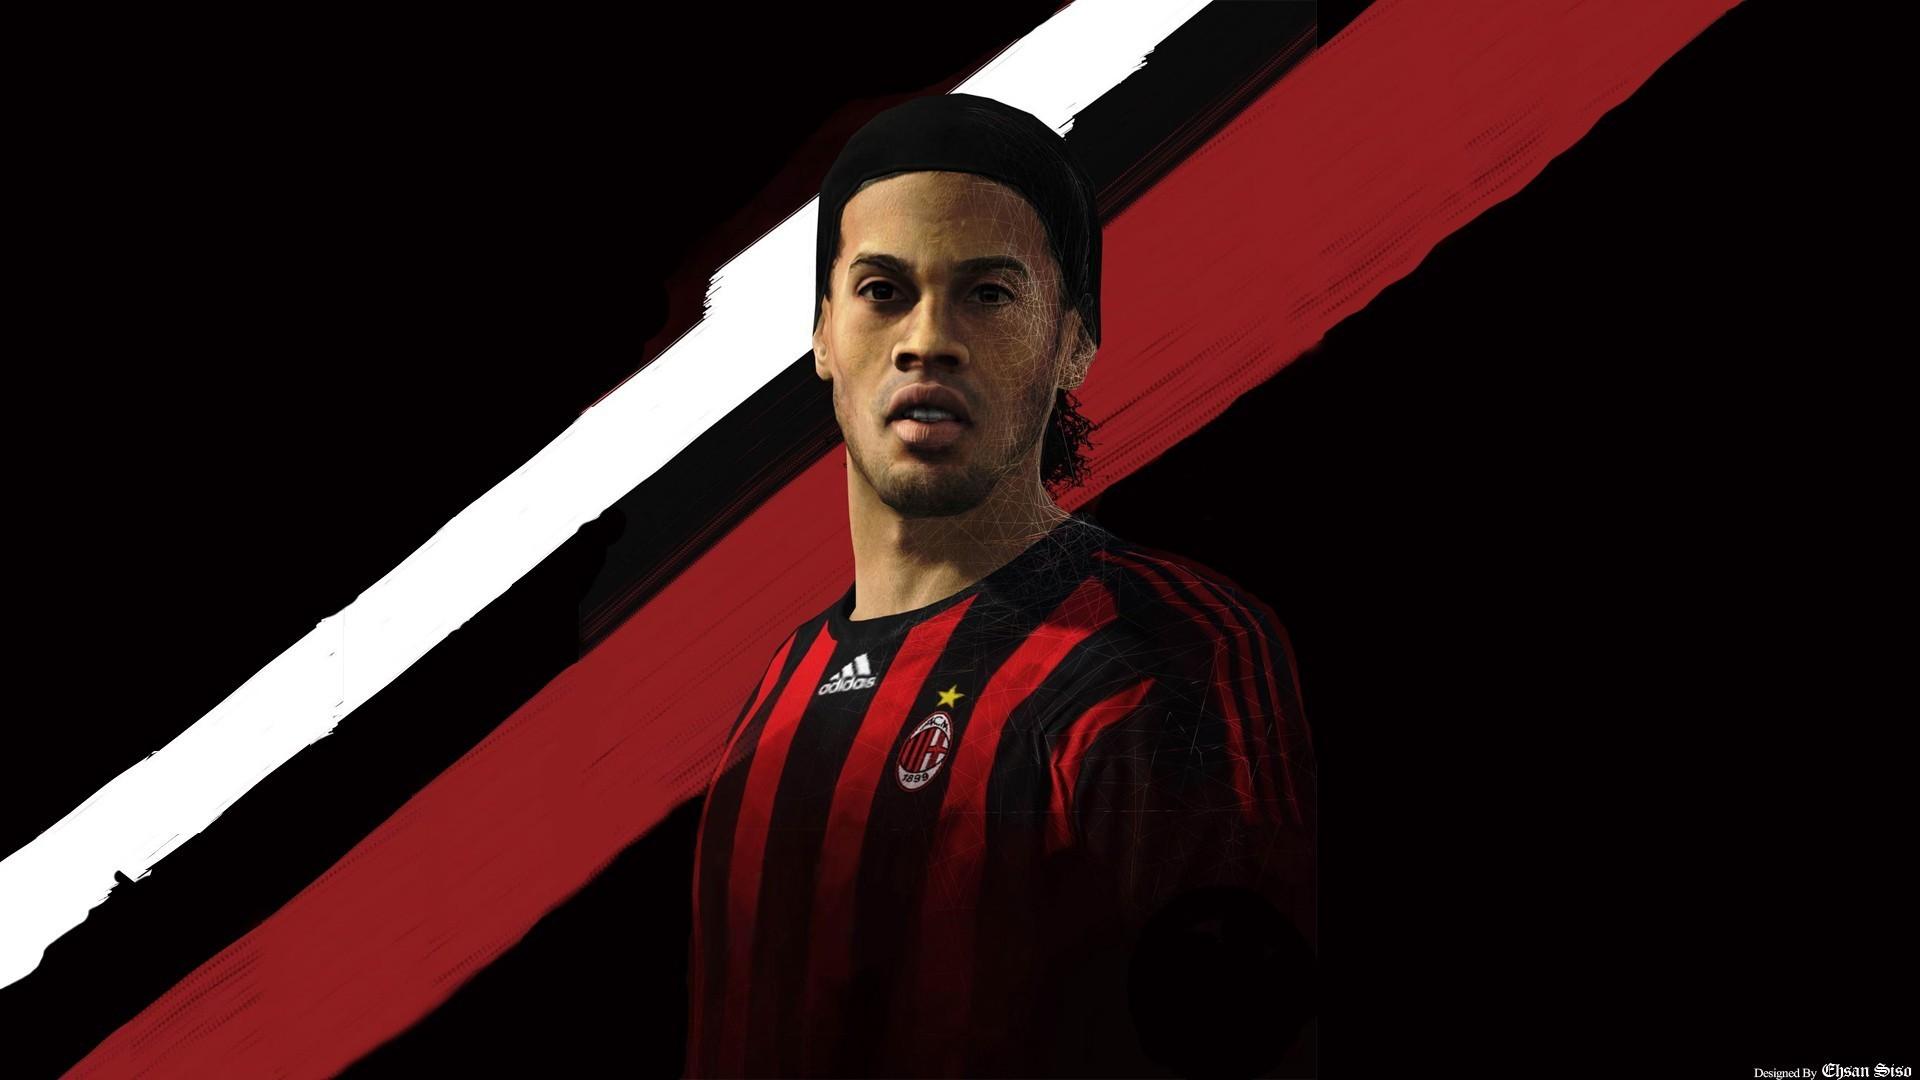 FIFA, Ronaldinho, AC Milan Wallpapers HD / Desktop and Mobile Backgrounds